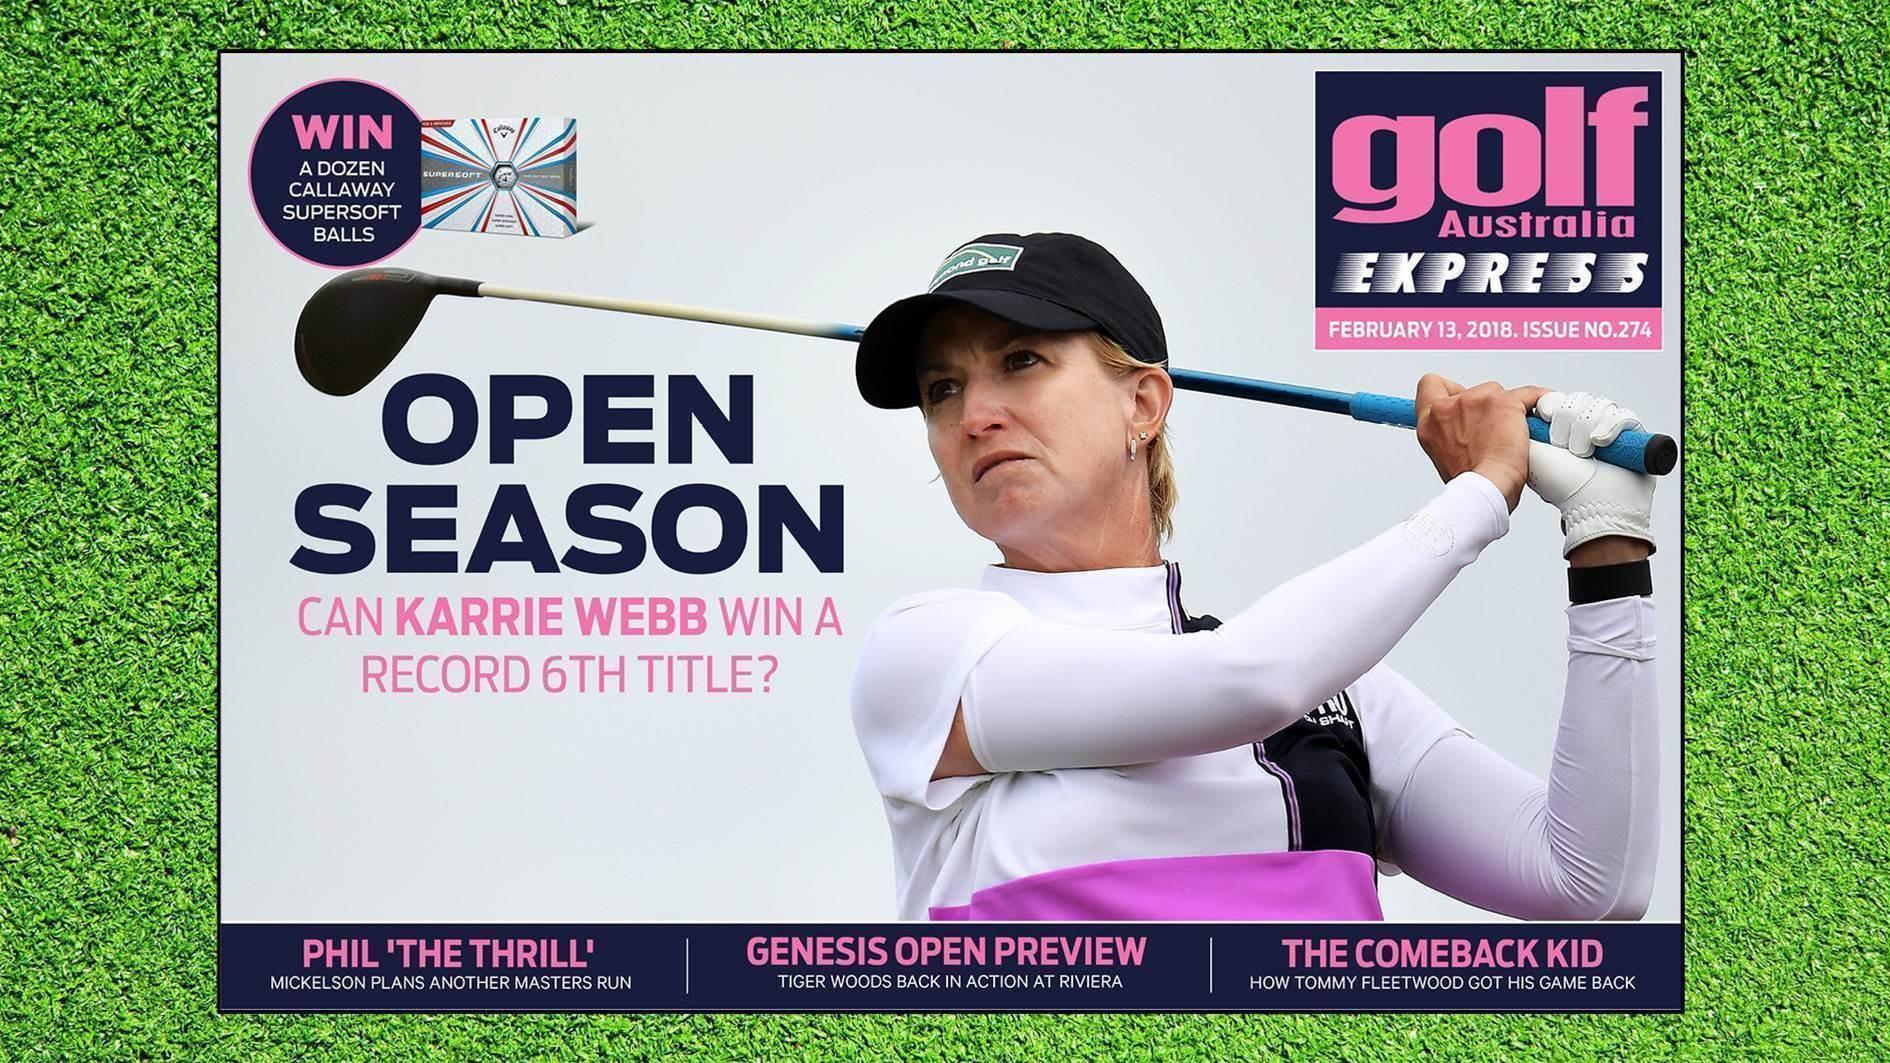 GA Express #274: Women's Australian Open Preview